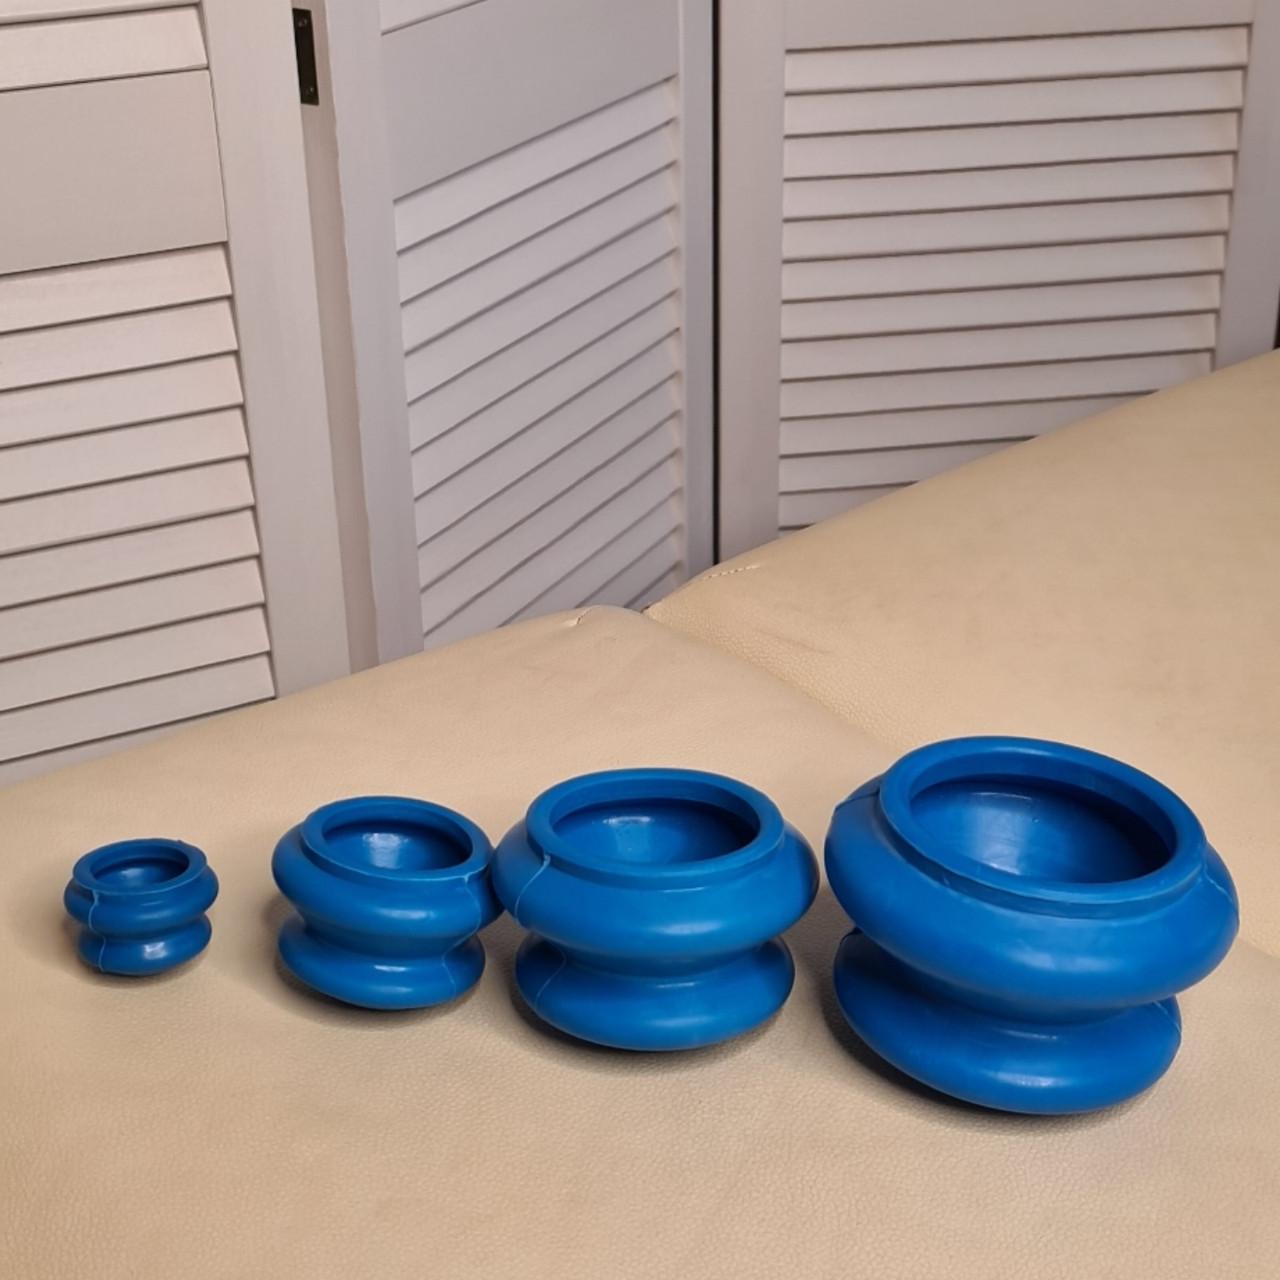 Резинові масажні вакуумні банки 4 штуки для масажу синие Резиновые массажные вакуумные банки для масса